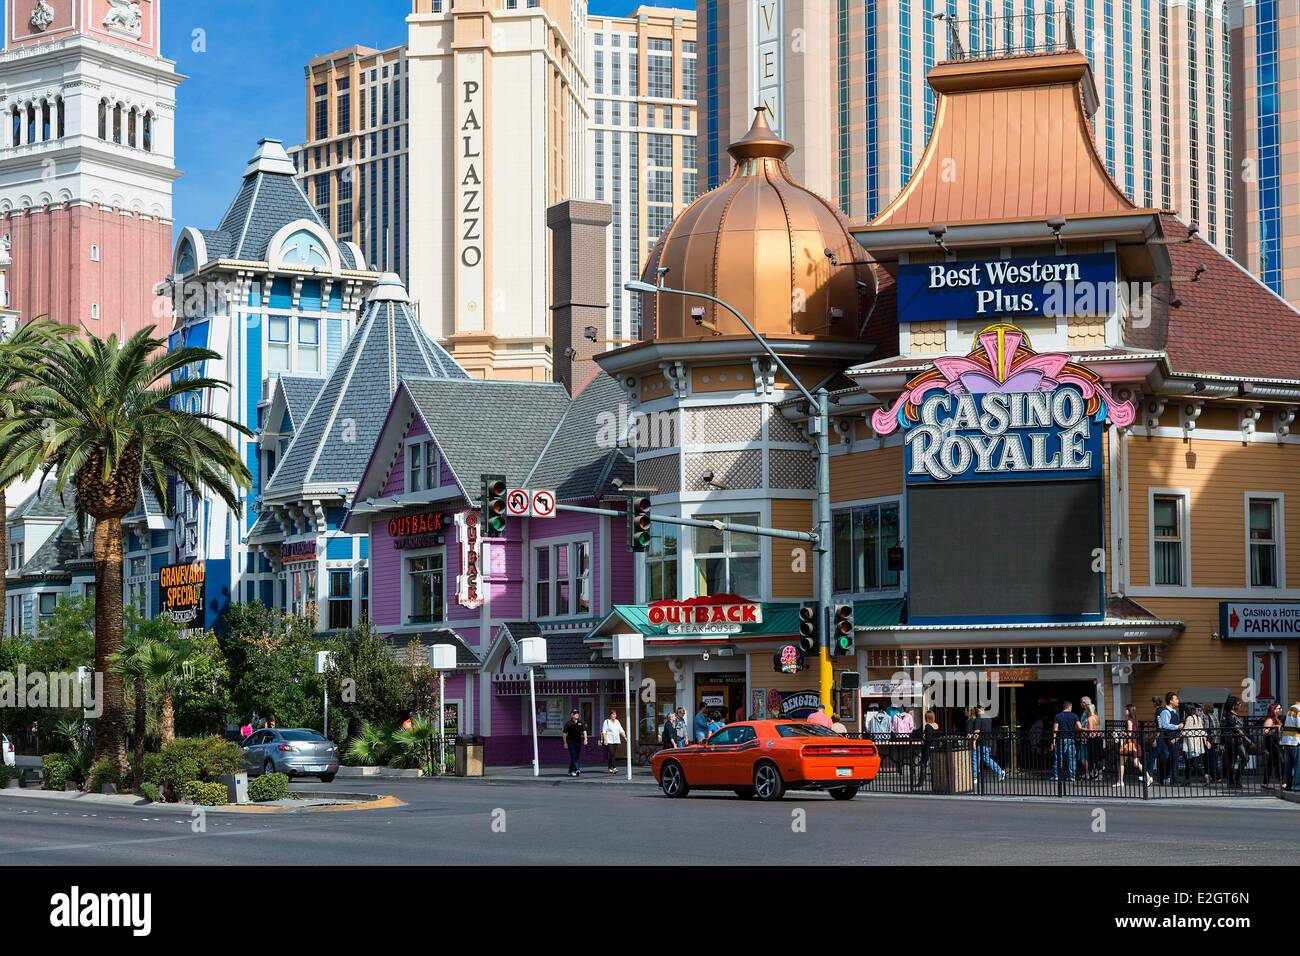 United States Nevada Las Vegas Luxury Hotels and famous Las Vegas Strip - Stock Image